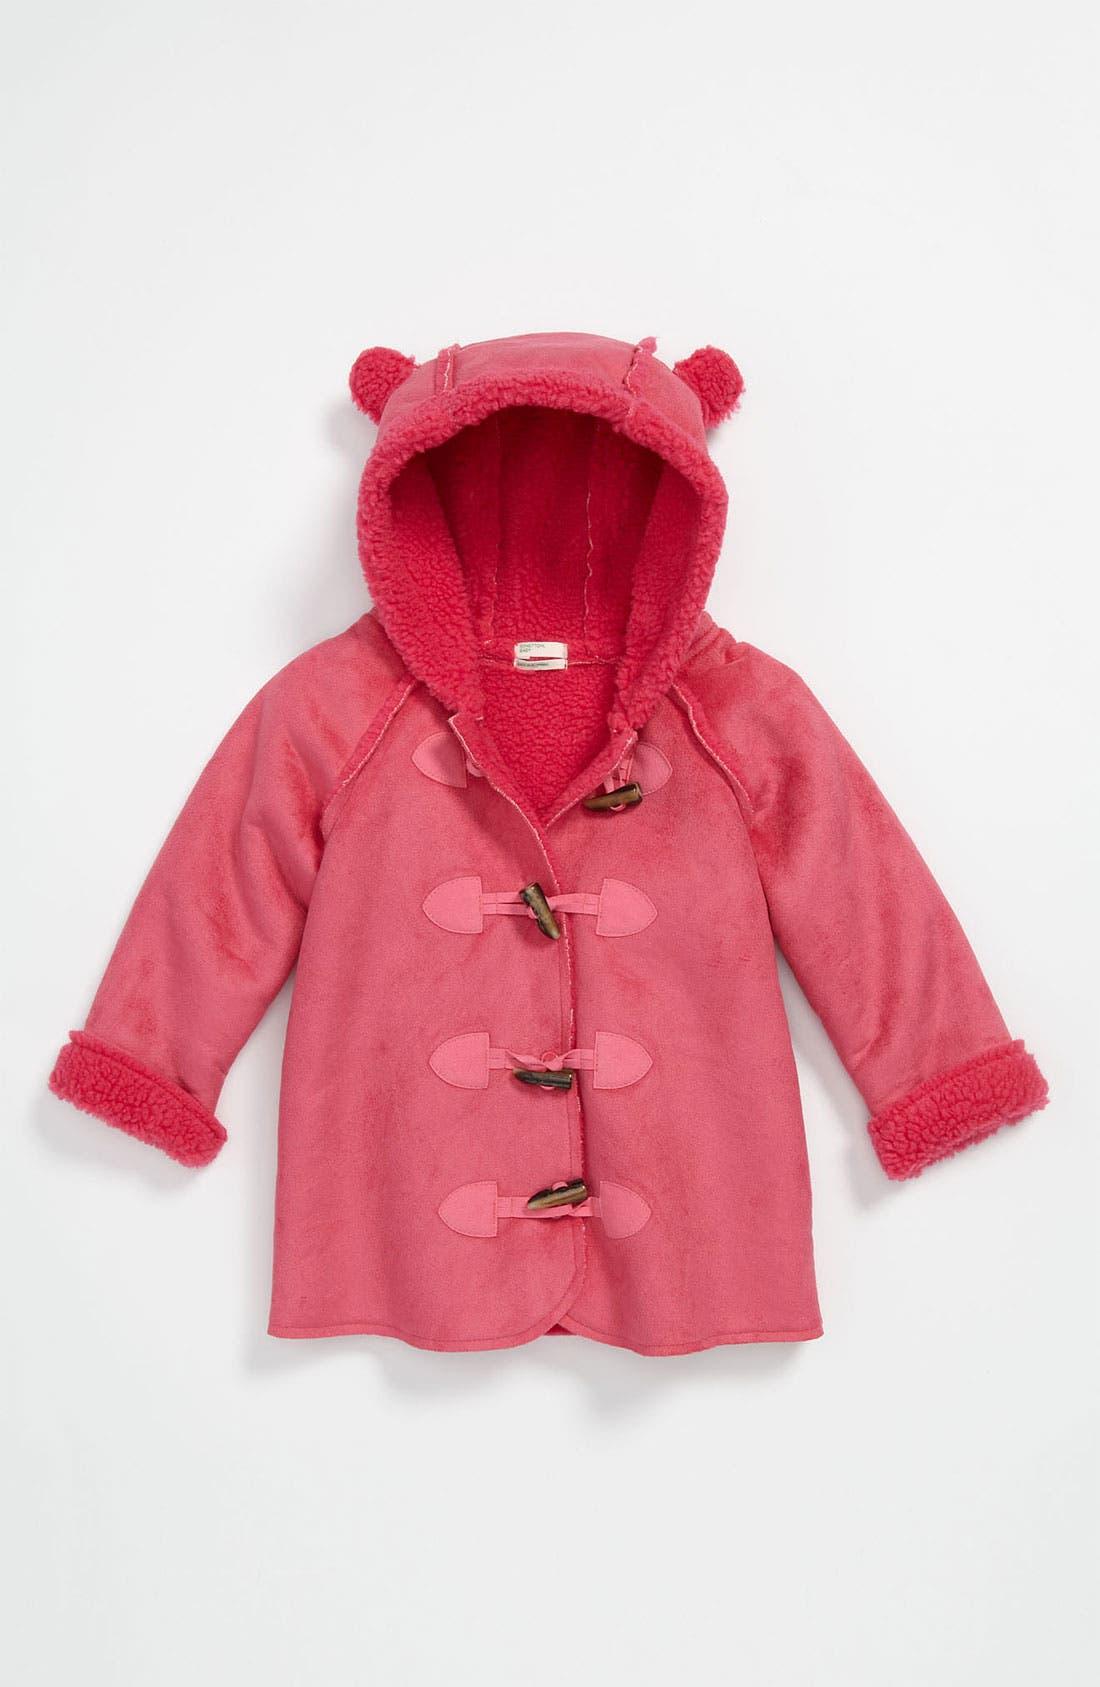 Main Image - United Colors of Benetton Kids Jacket (Infant)